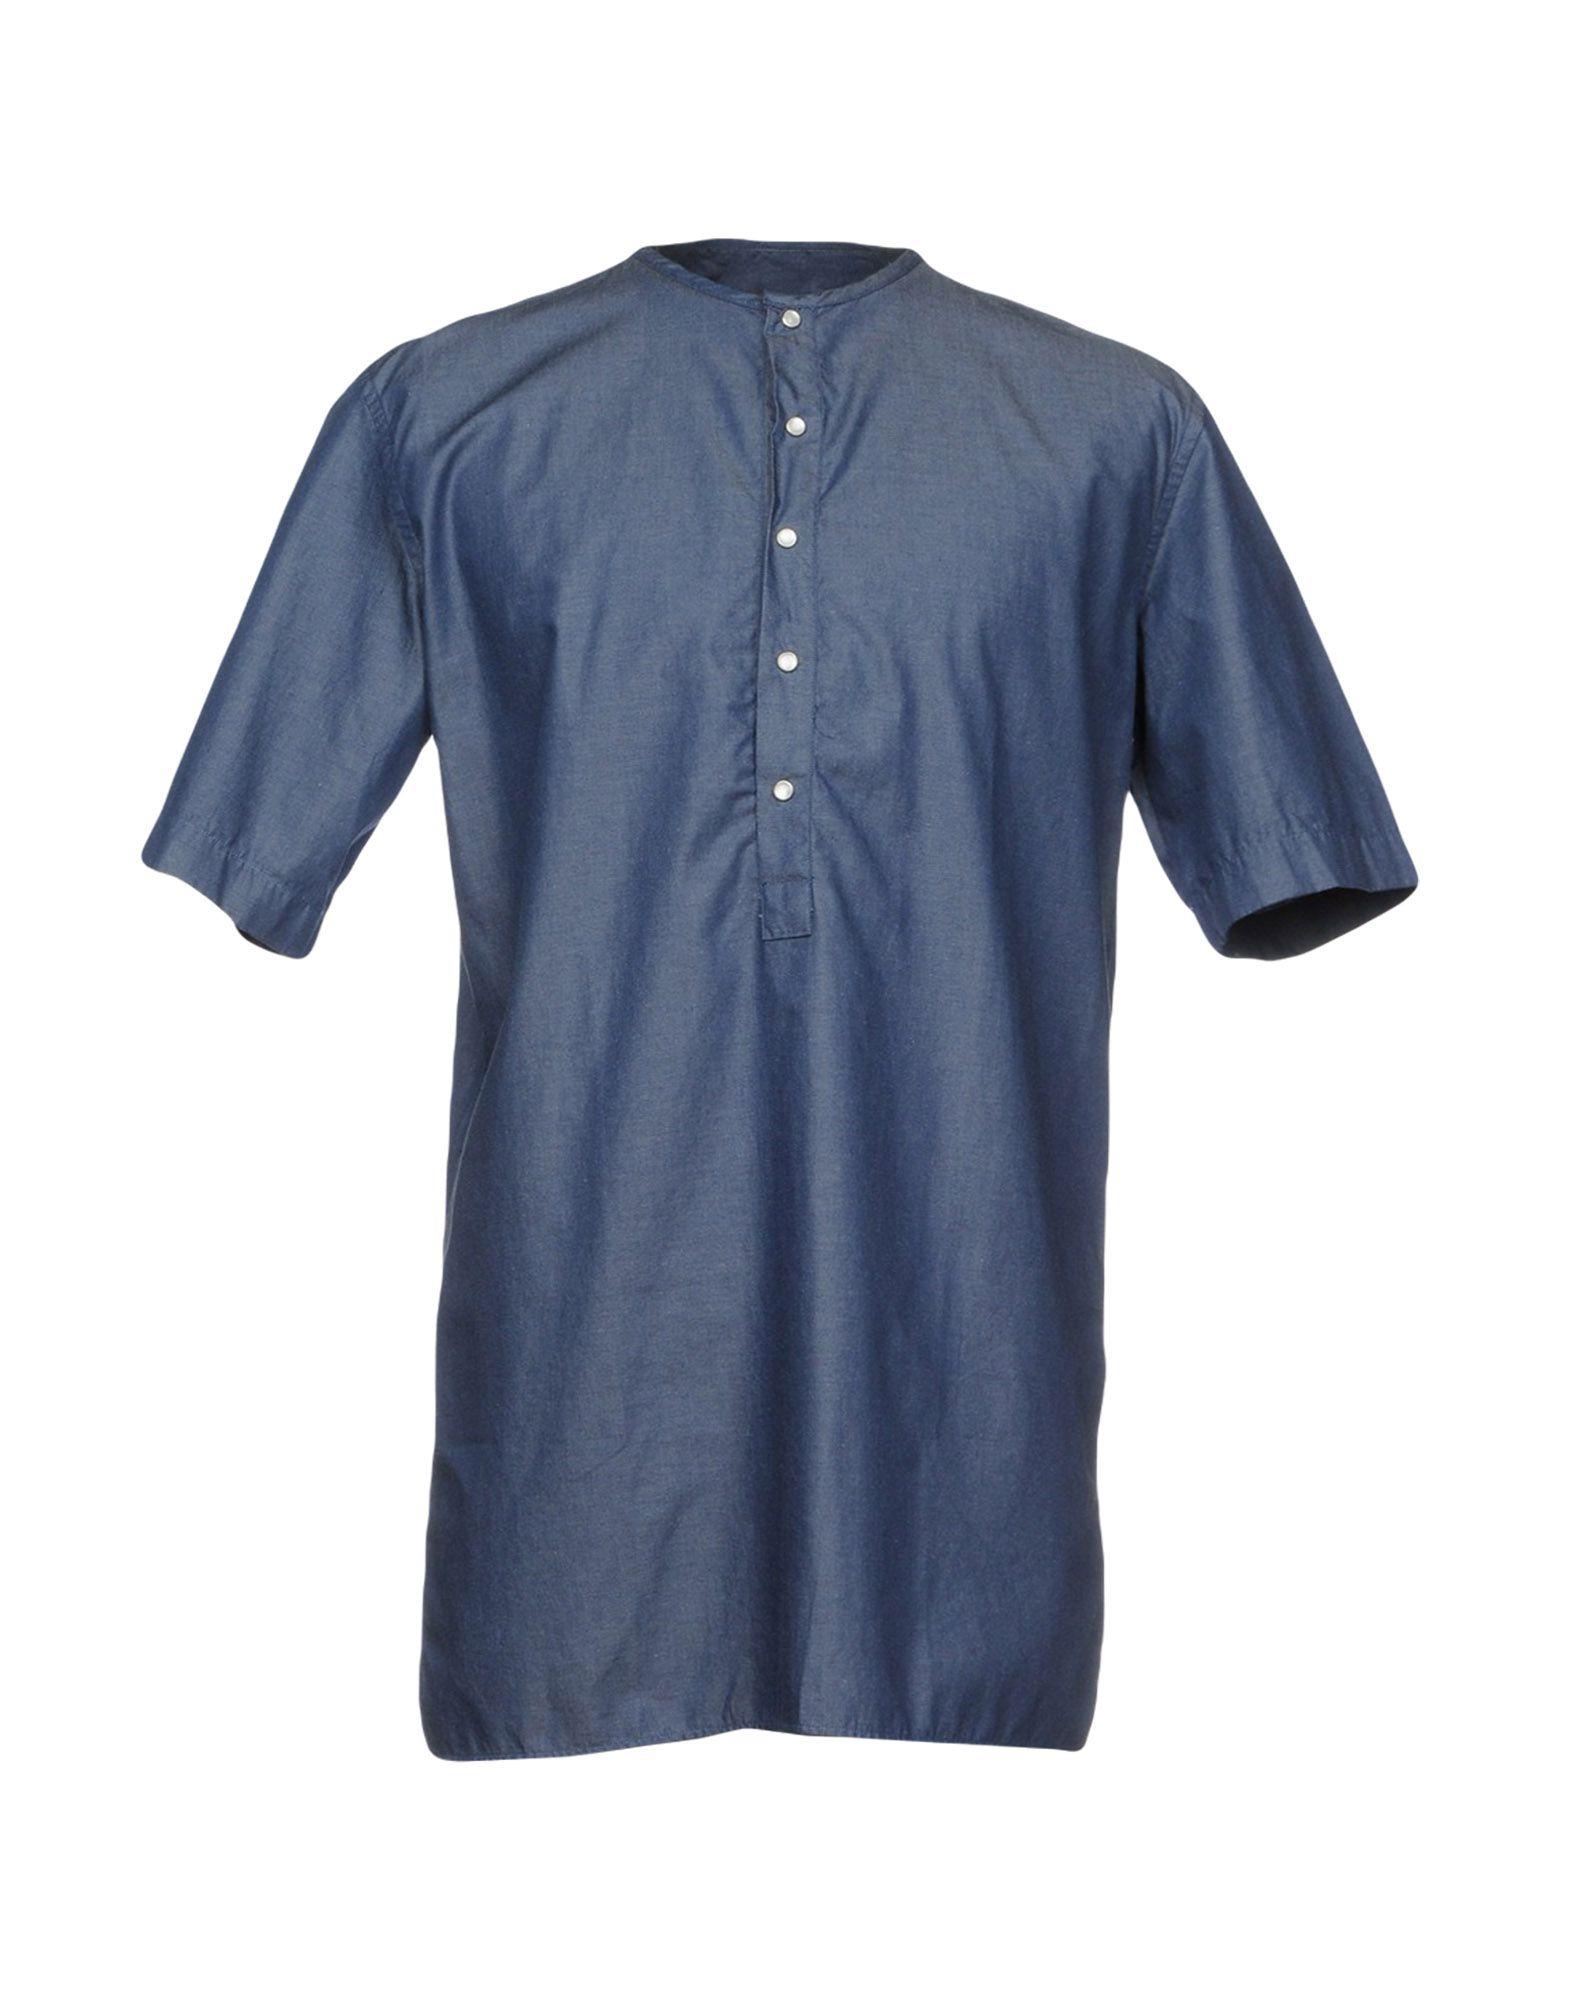 ФОТО 26.7 twentysixseven Джинсовая рубашка